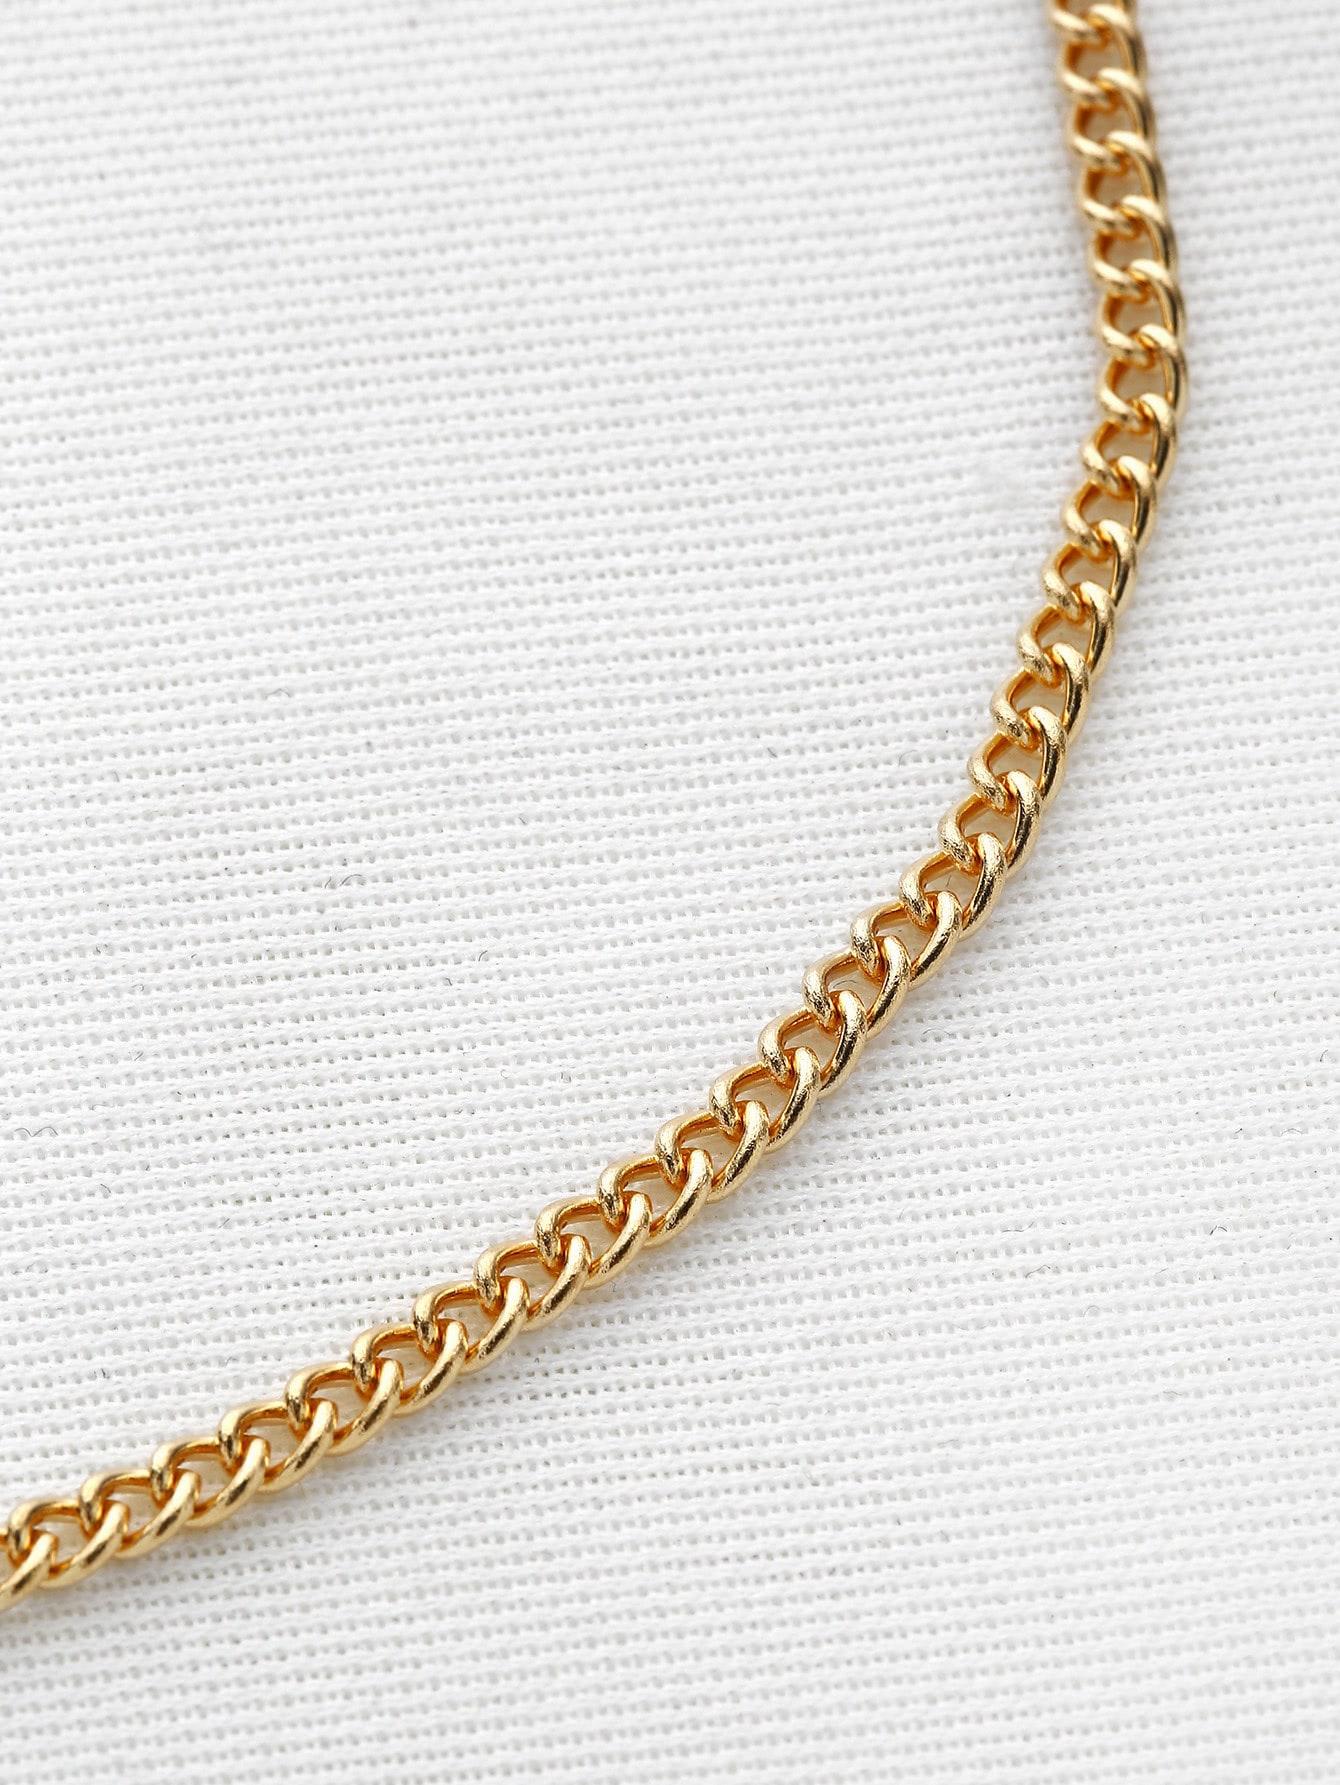 necklacenc170426301_2